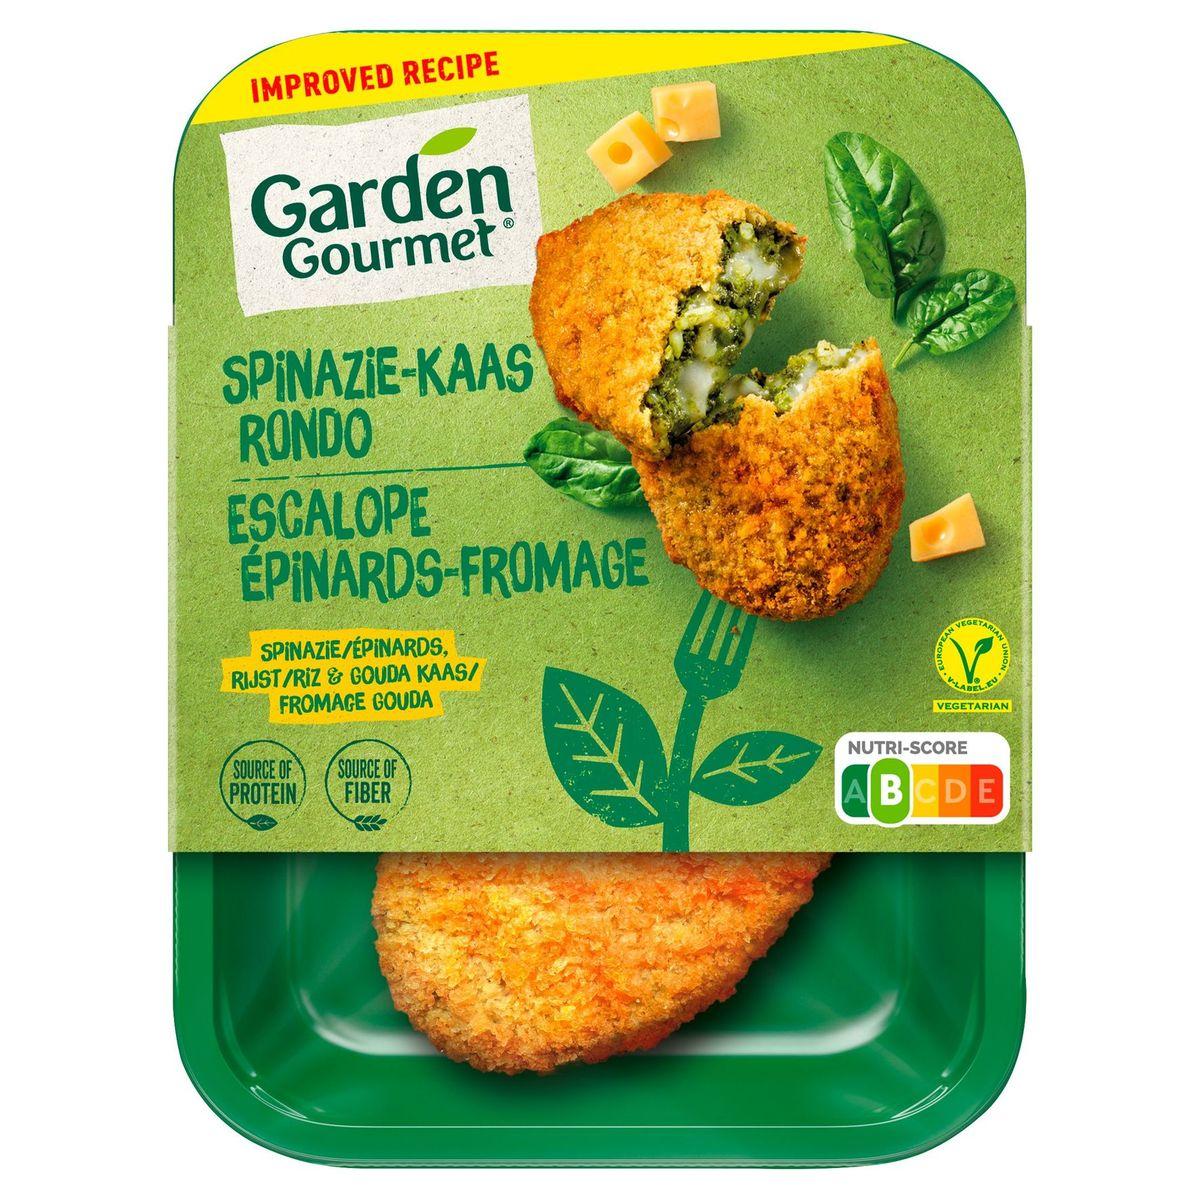 GARDEN GOURMET Vegetarische Spinazie-Kaas Rondo x2 180 g